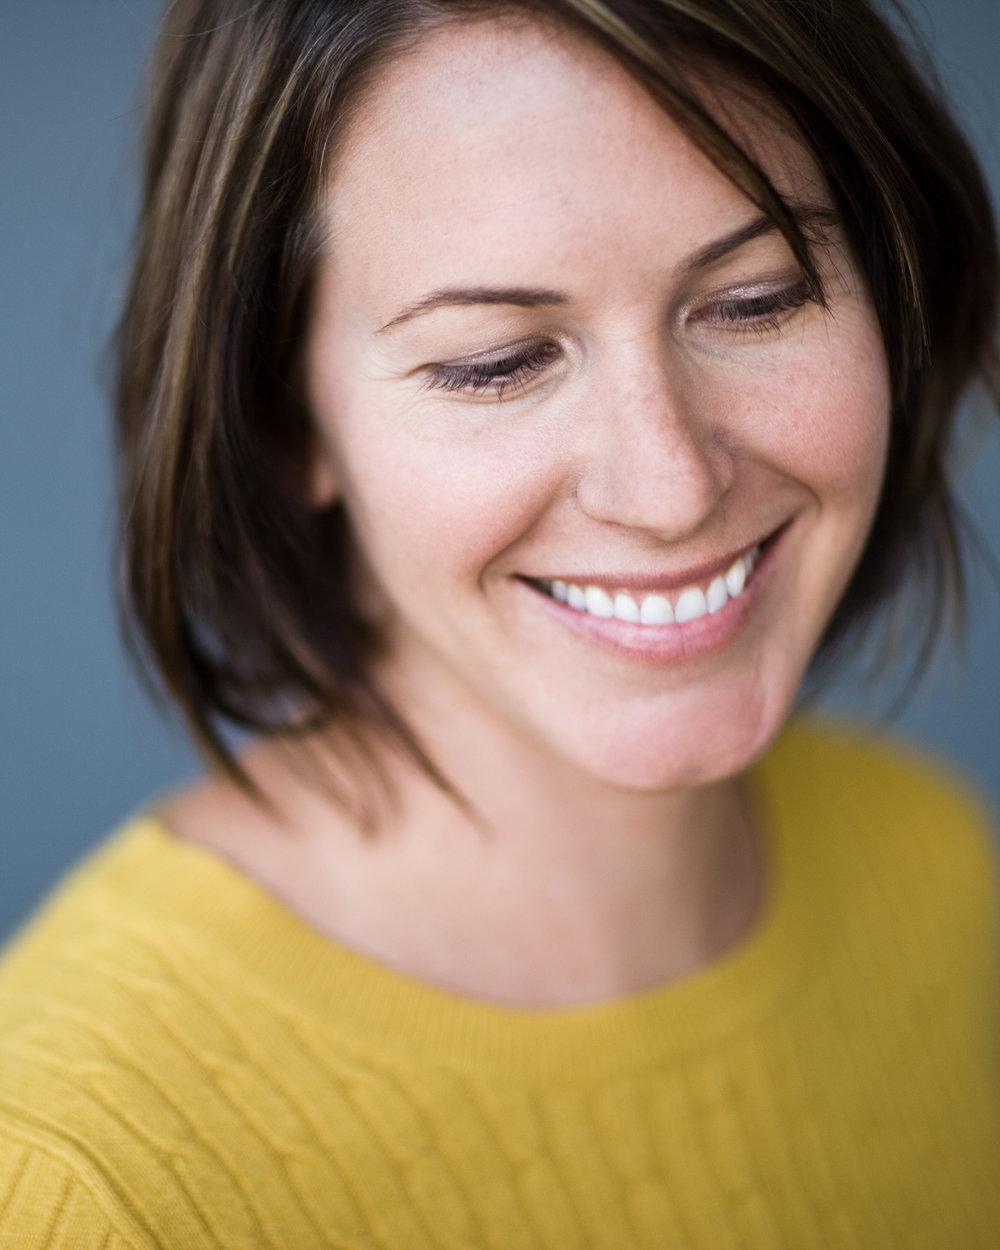 Happy Smiling Business Headshot